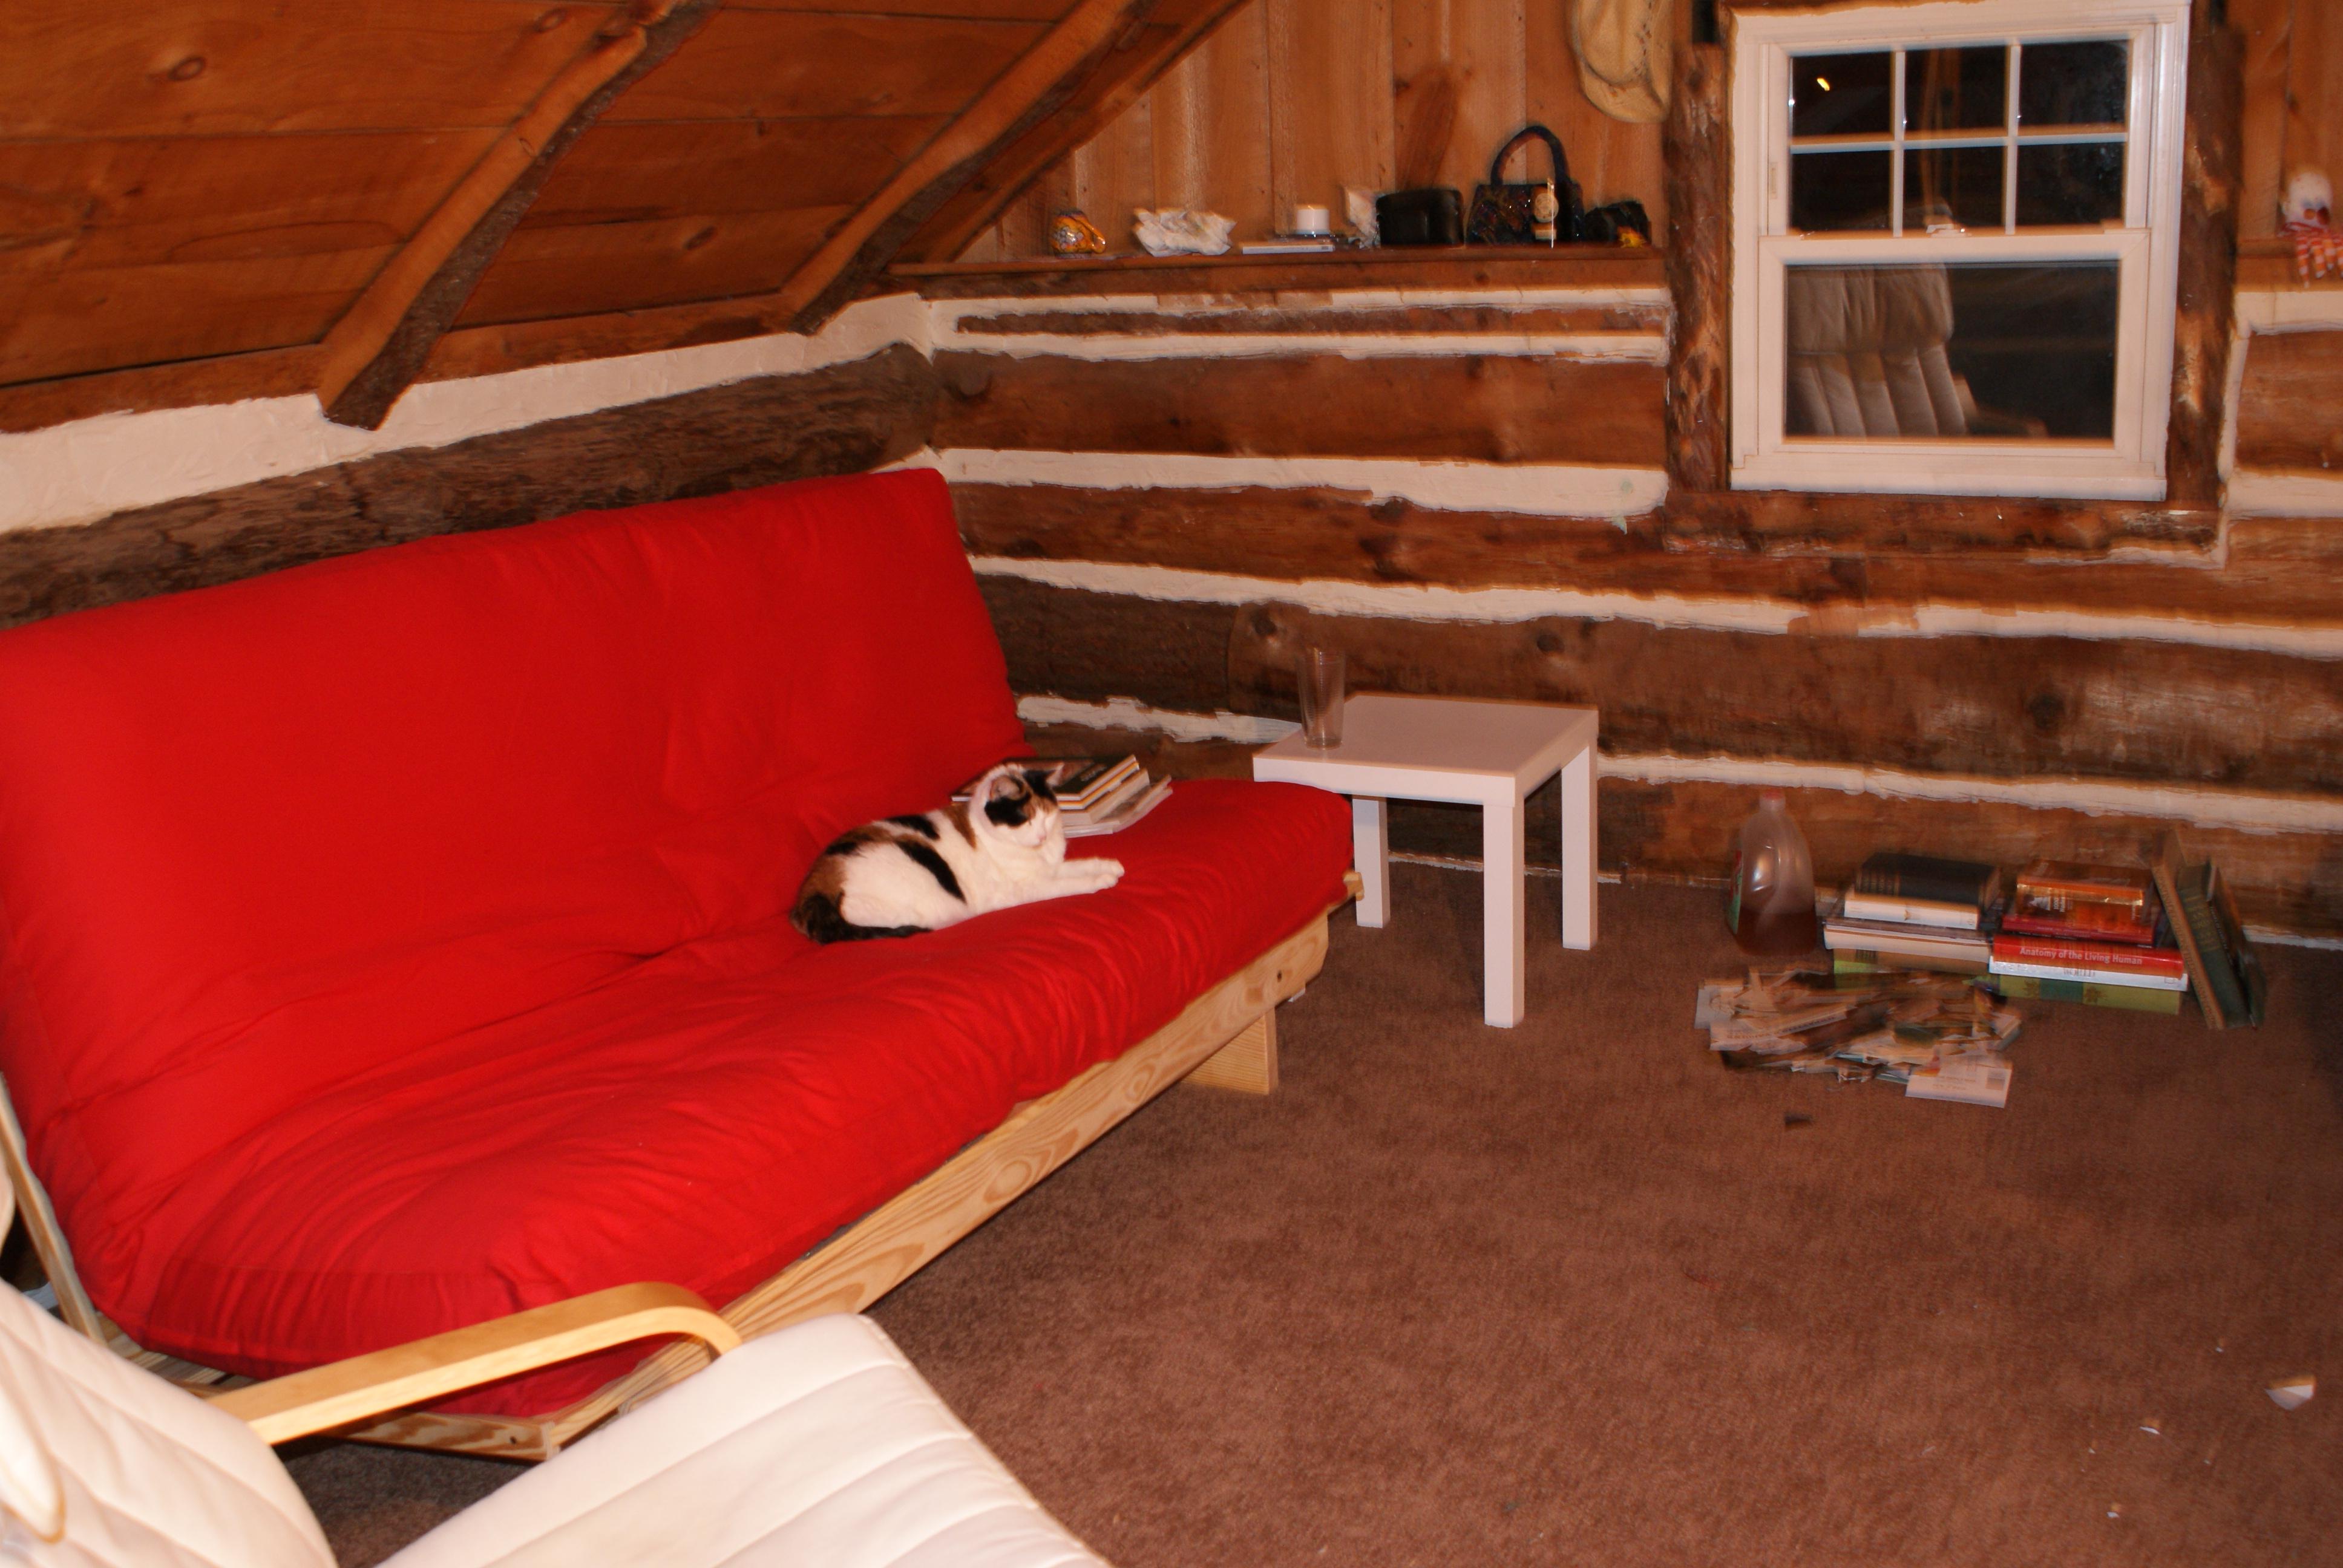 Fine Woodworking 85 Wooden PDF american woodshop plans | pretty53kim